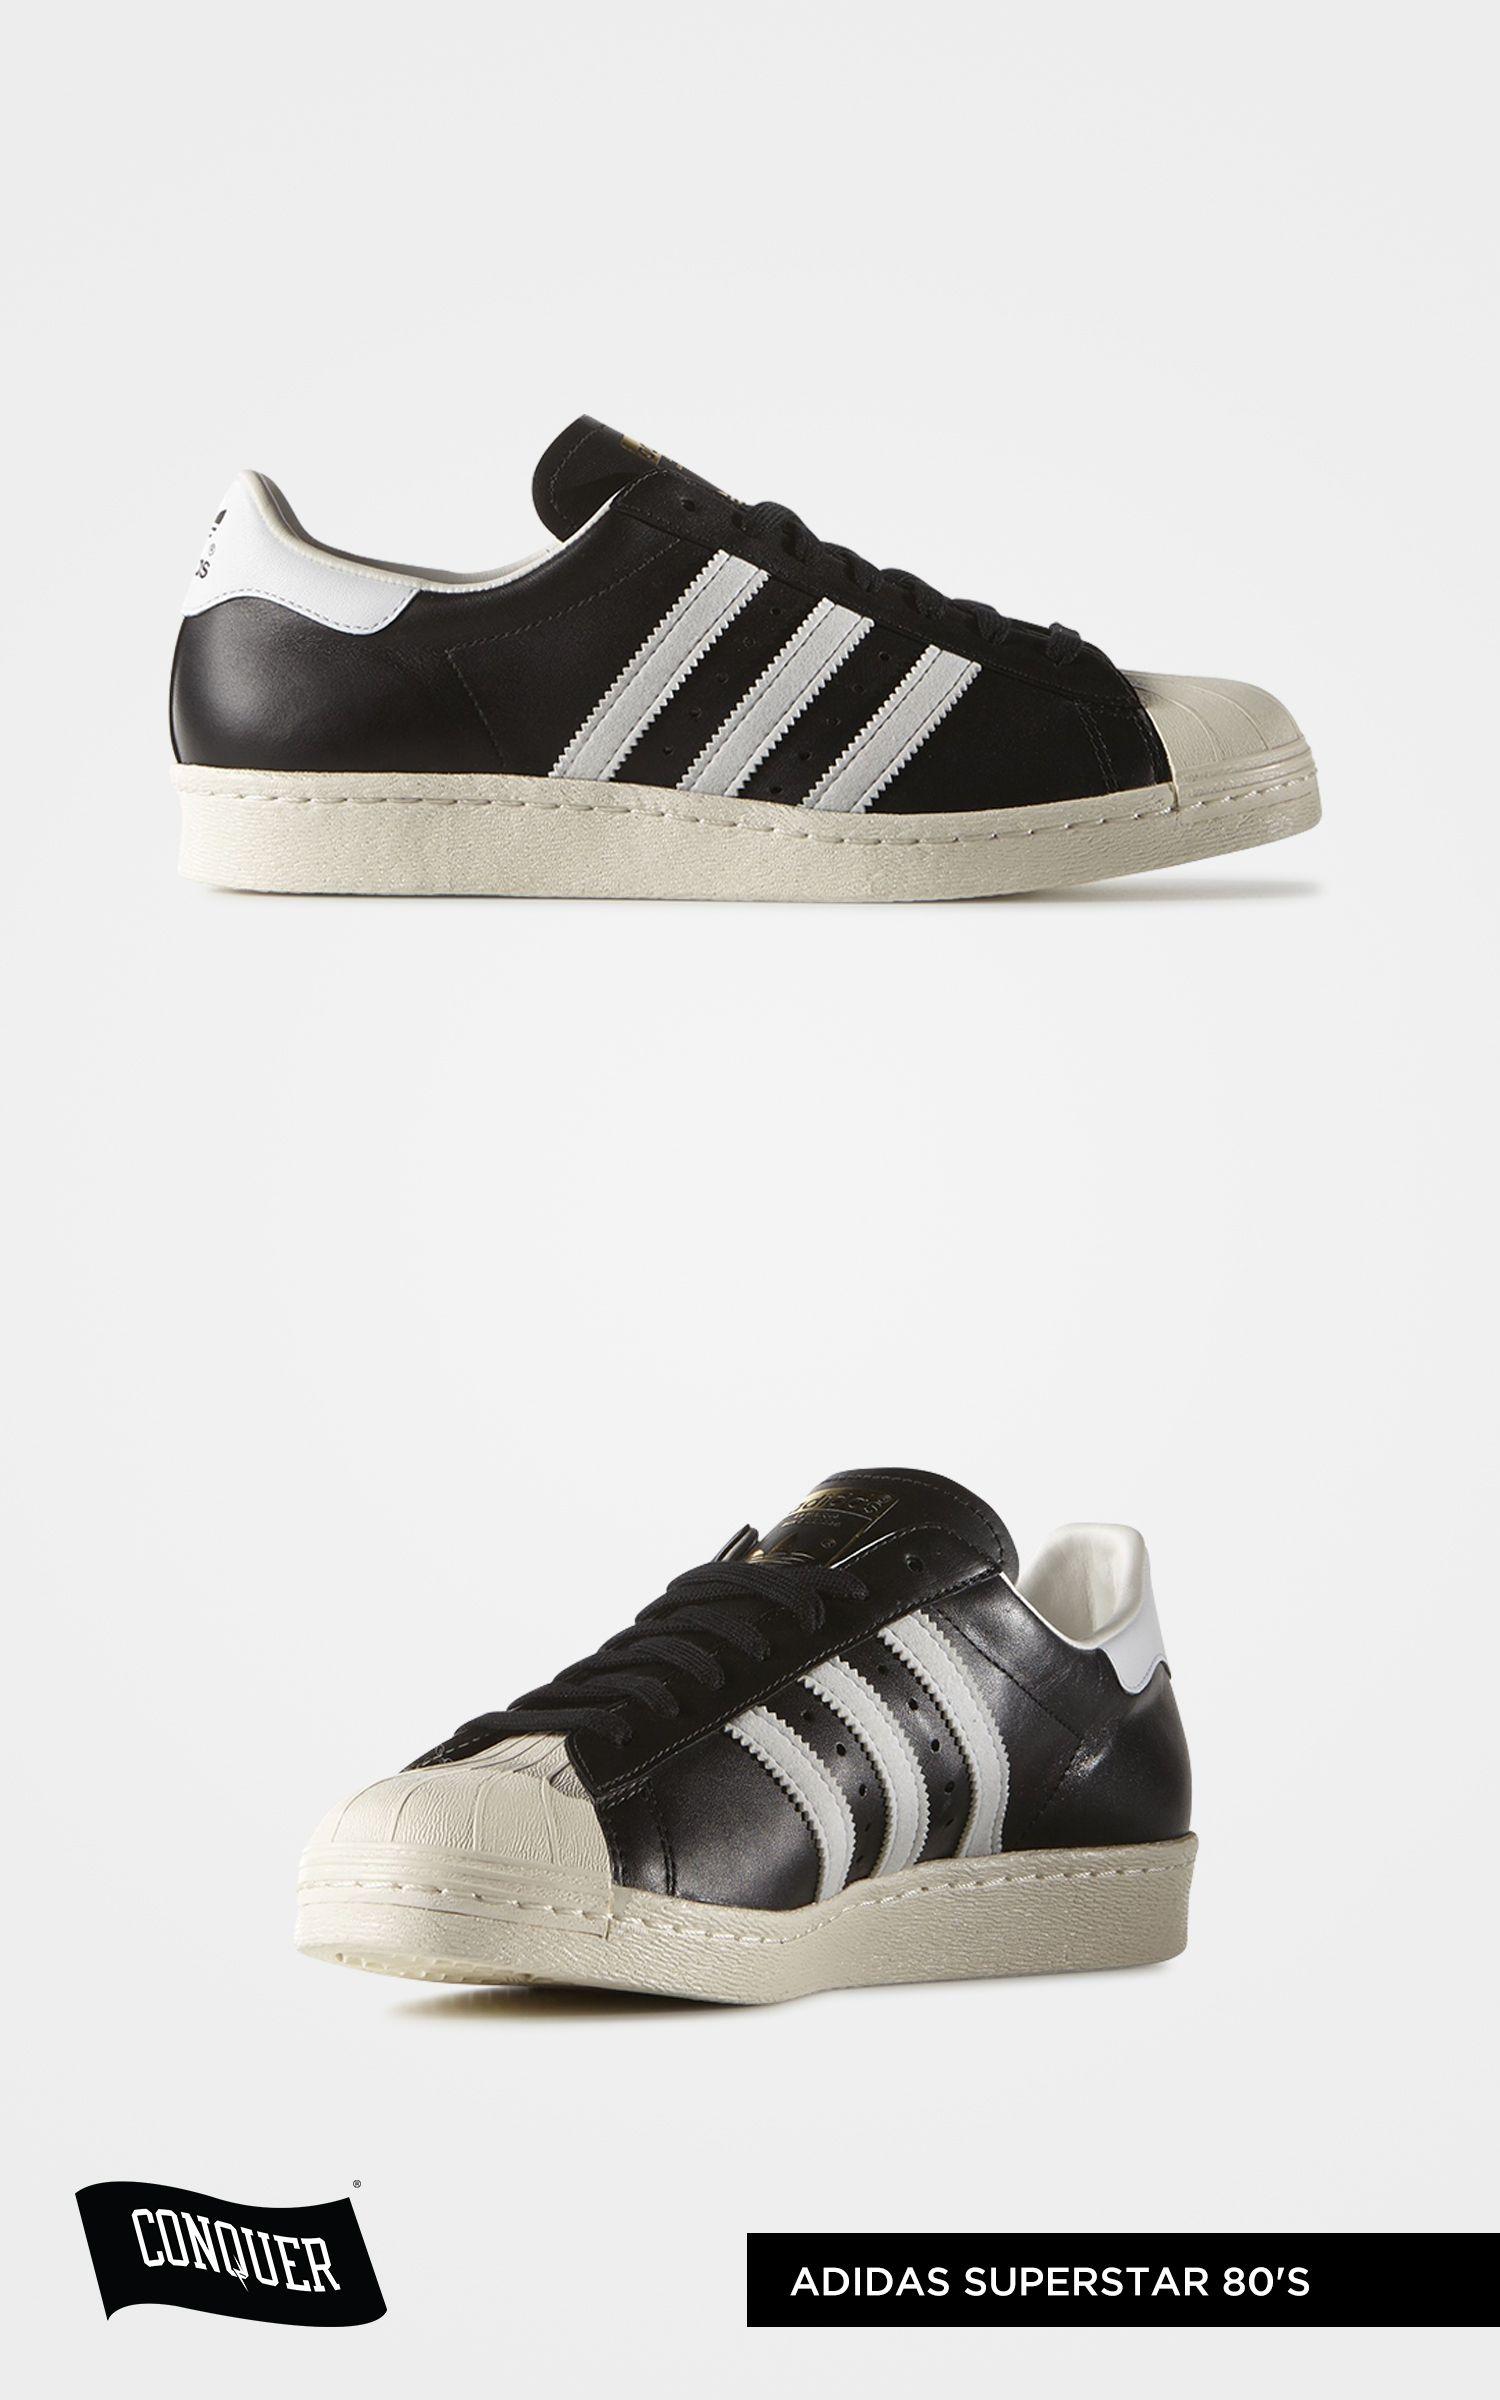 80s Adidas Efe62 3dd60 Superstar Core Negro Low Price 5RqjL3Ac4